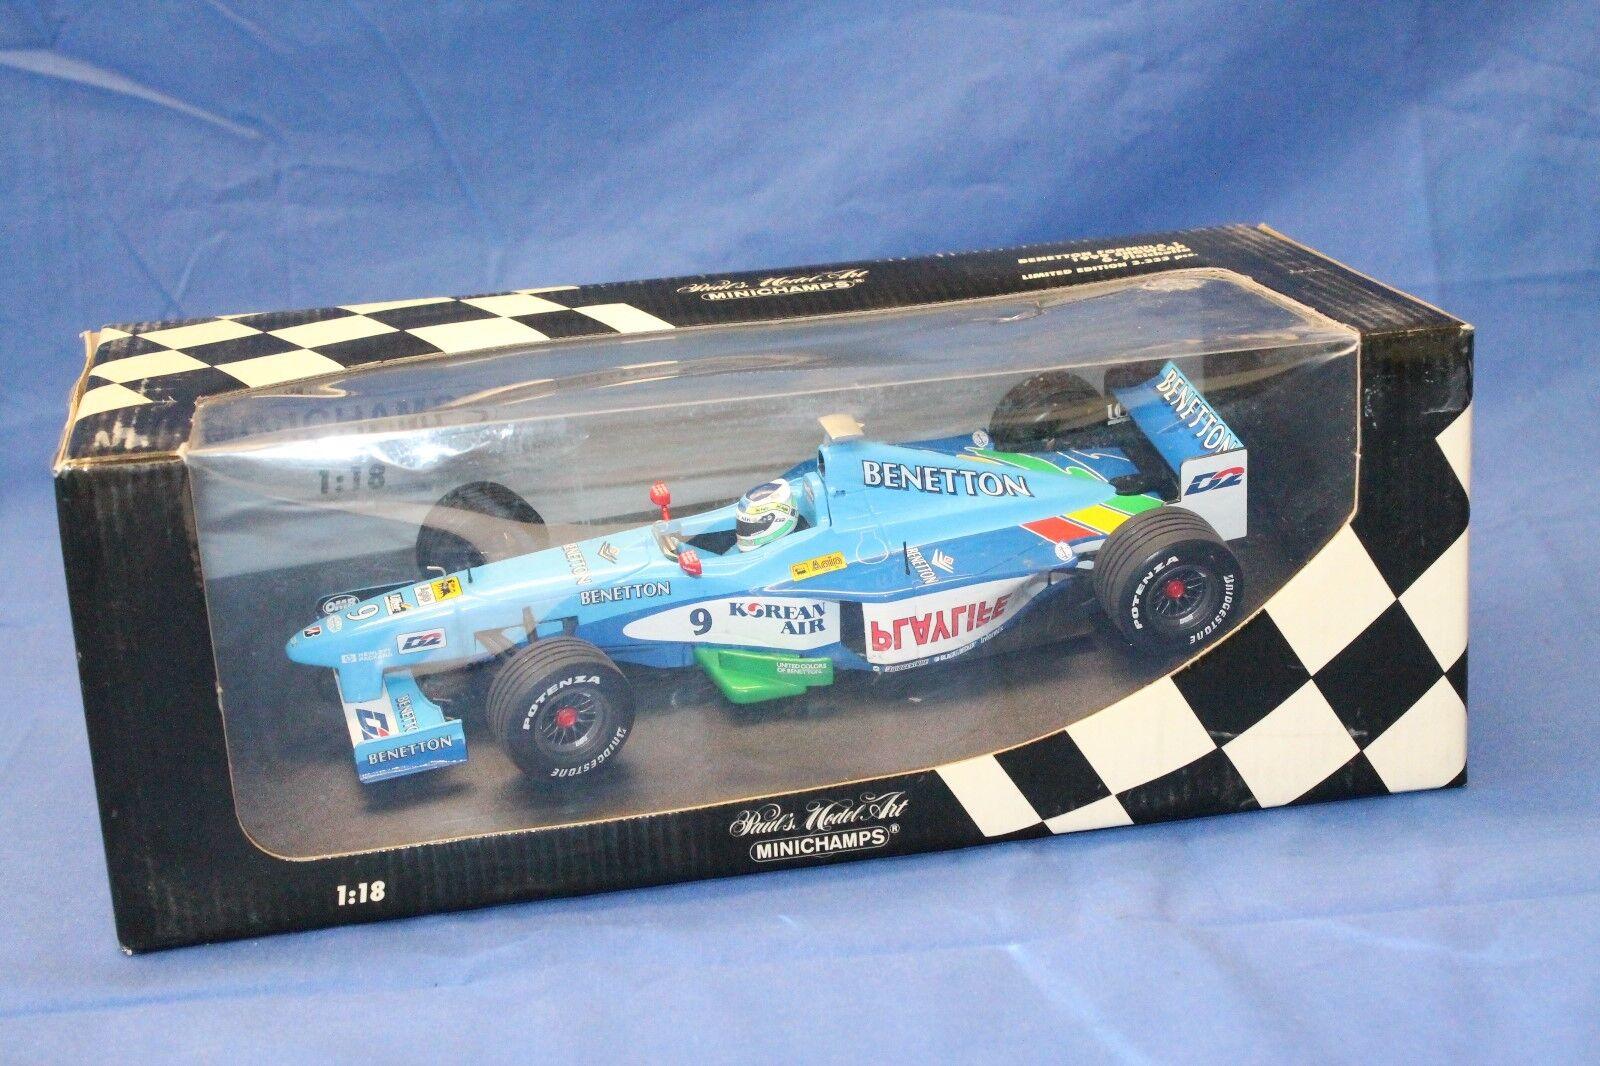 Minichamps 1 18 Benetton Formula 1 1999 car G FISICHELLA 180 990079